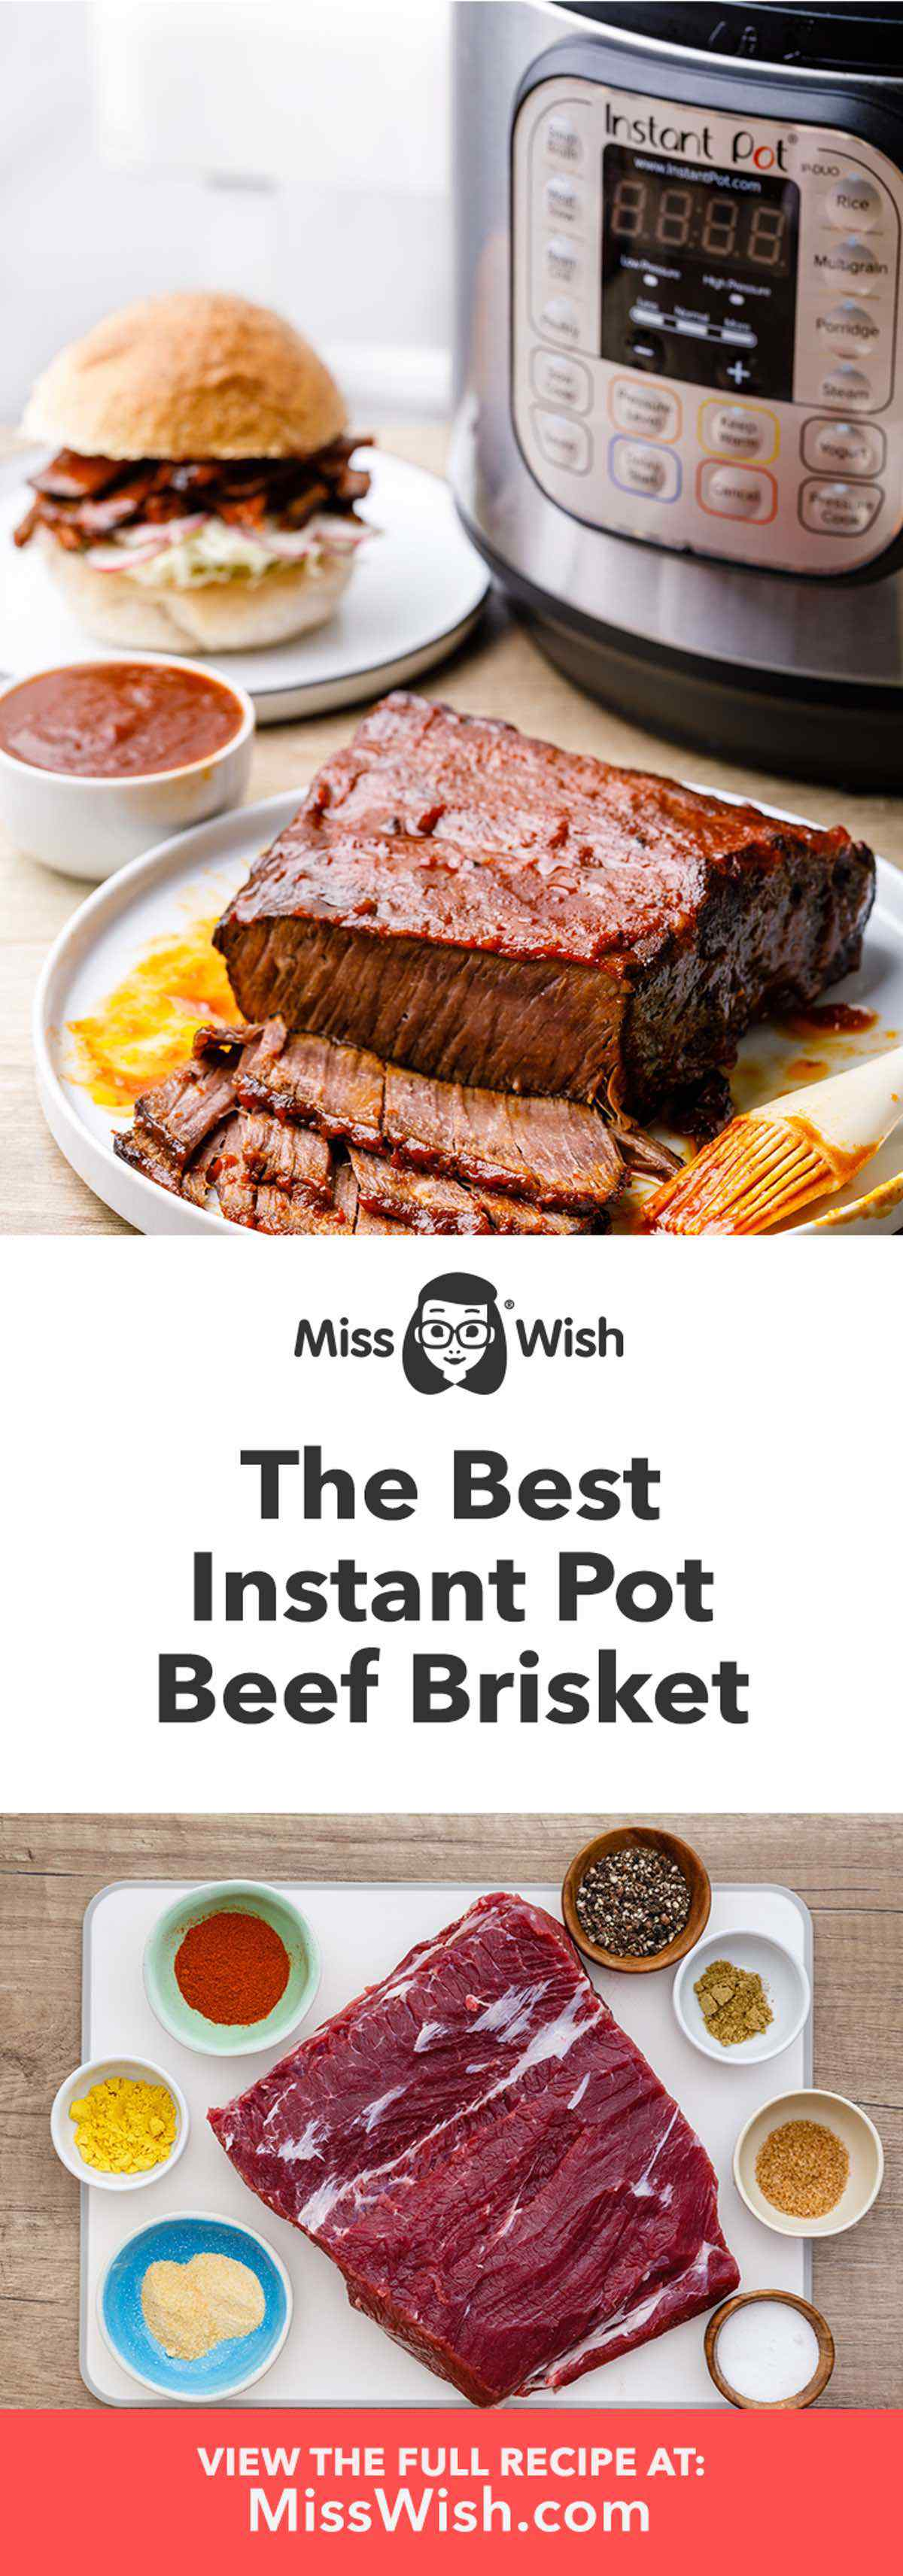 Instant Pot Brisket